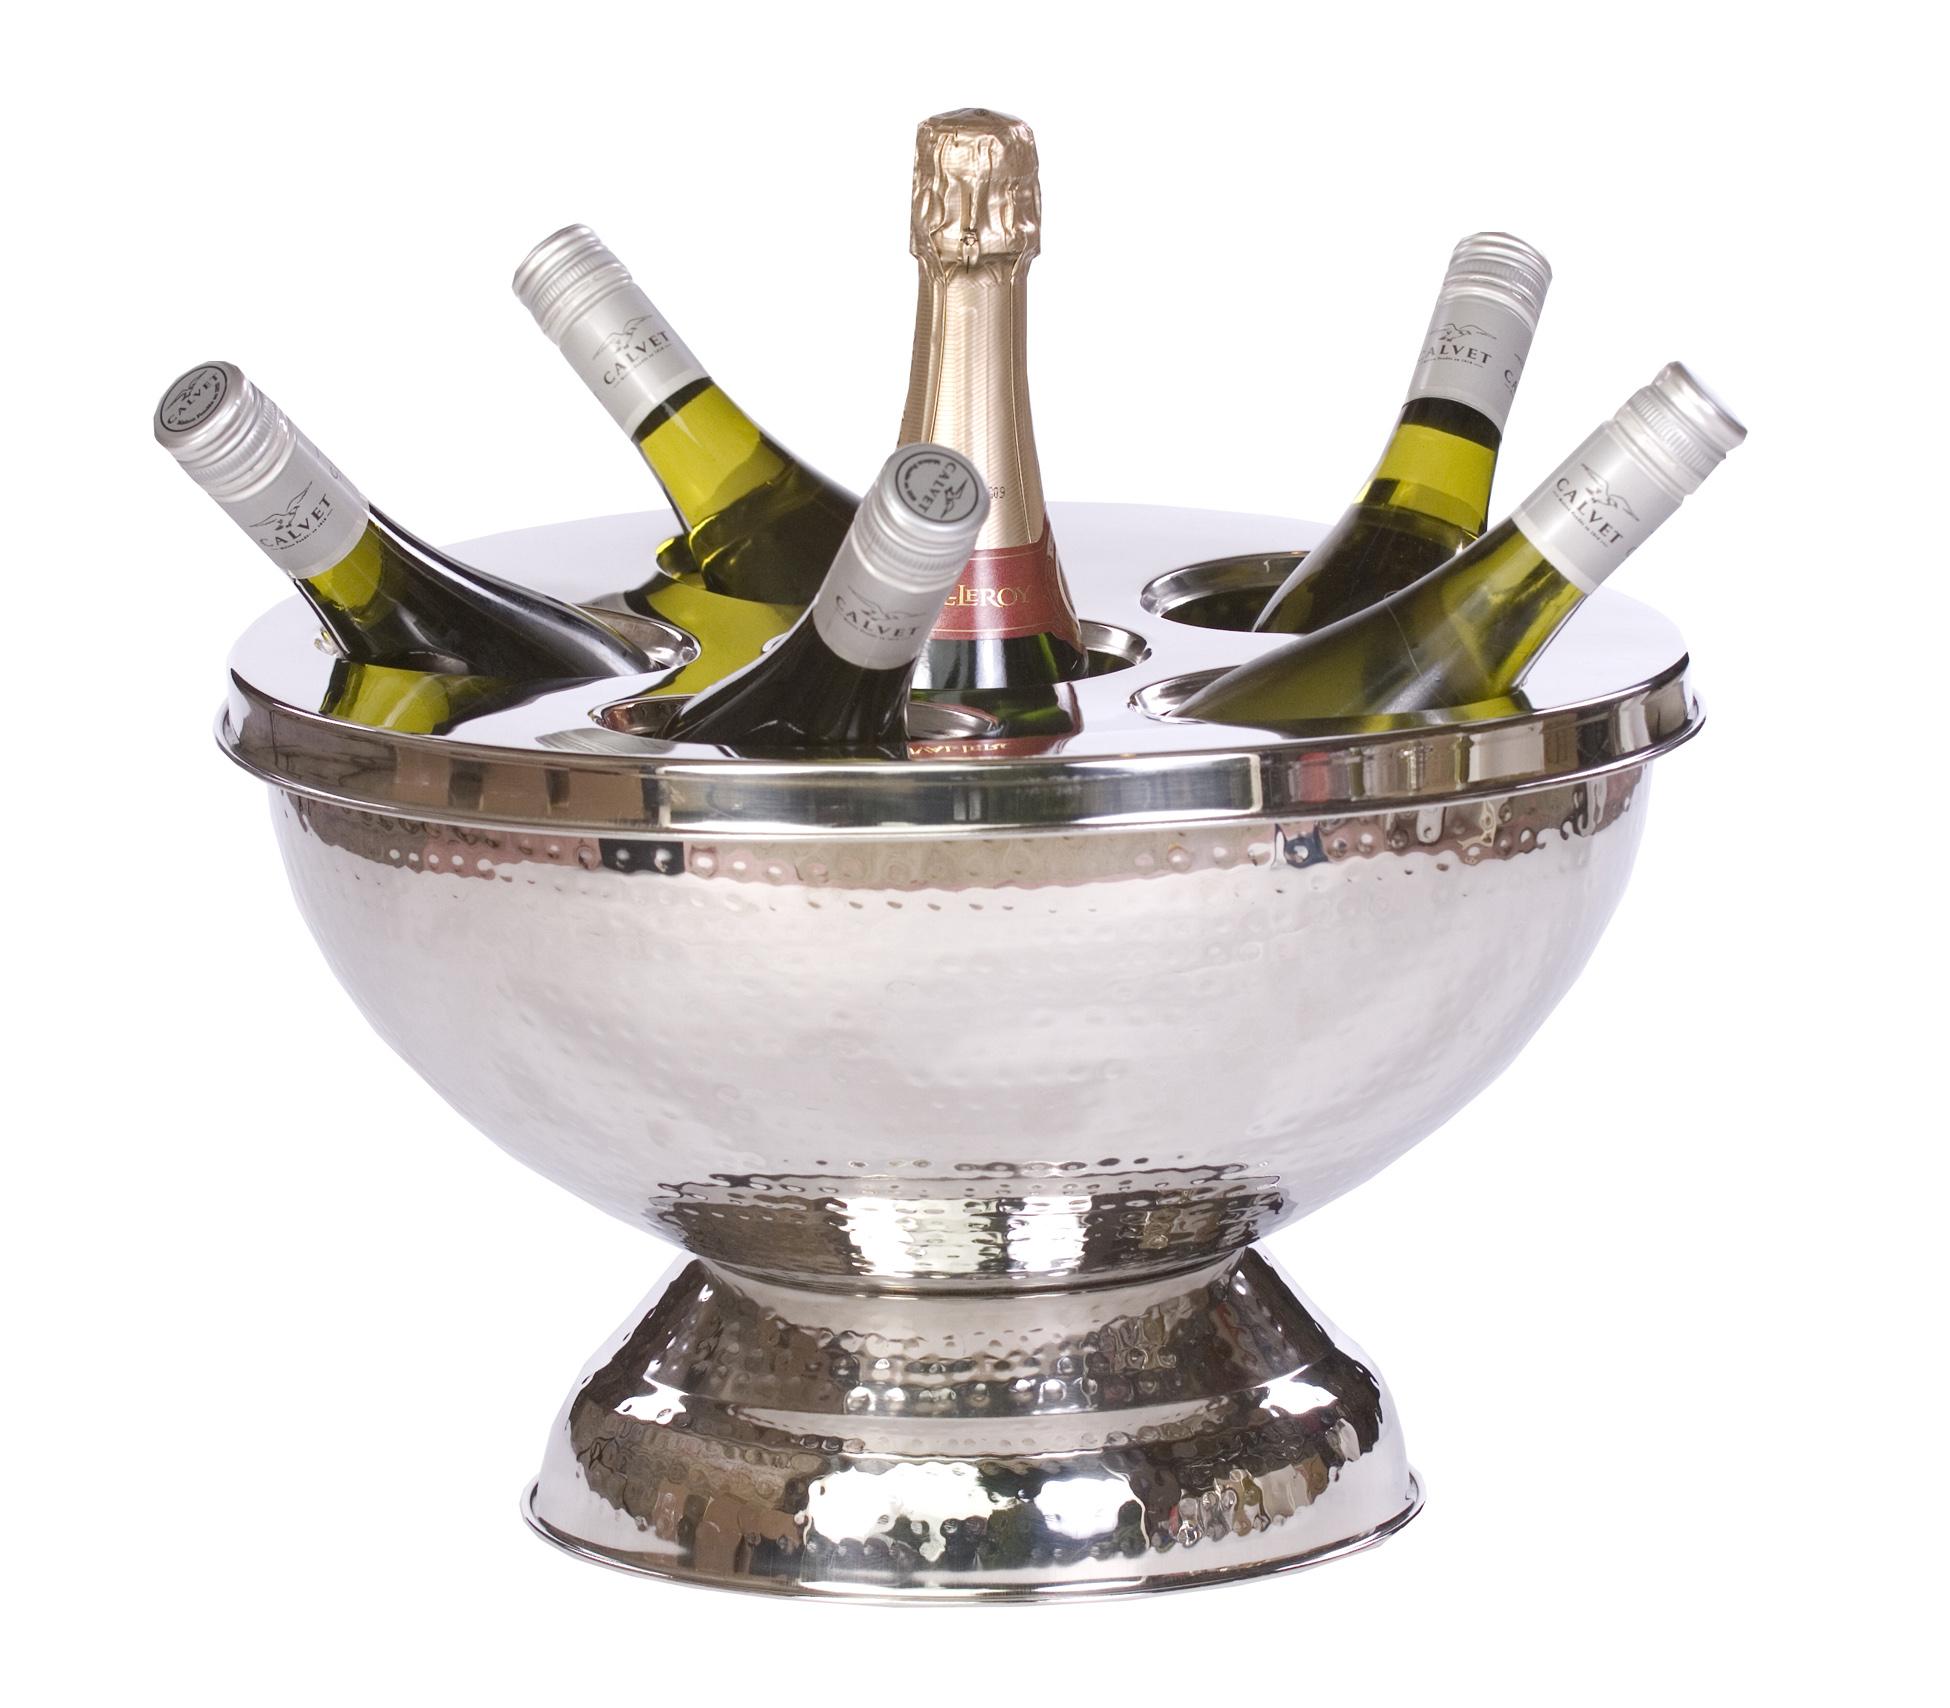 Eddingtons 6 Bottle Champagne Wine Cooler Bucket Beer Ice